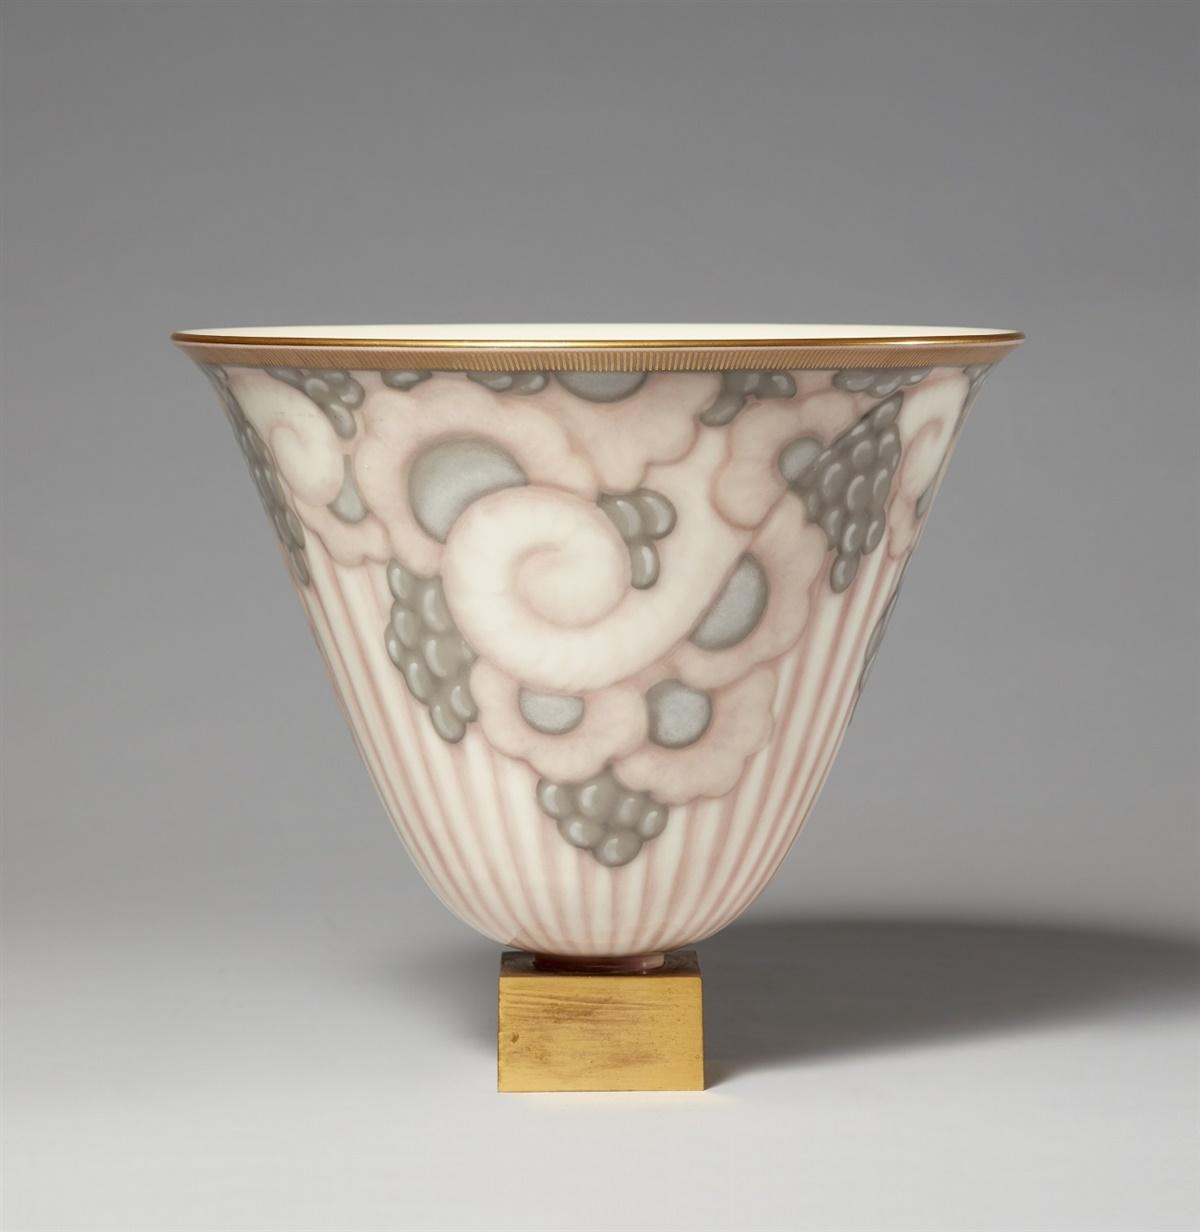 Lot 72 - Vase Ruhlmann N°3 sur socle carré en bronzePorzellan, Unterglasurdekor in Rosa und Grau, Vergoldung,